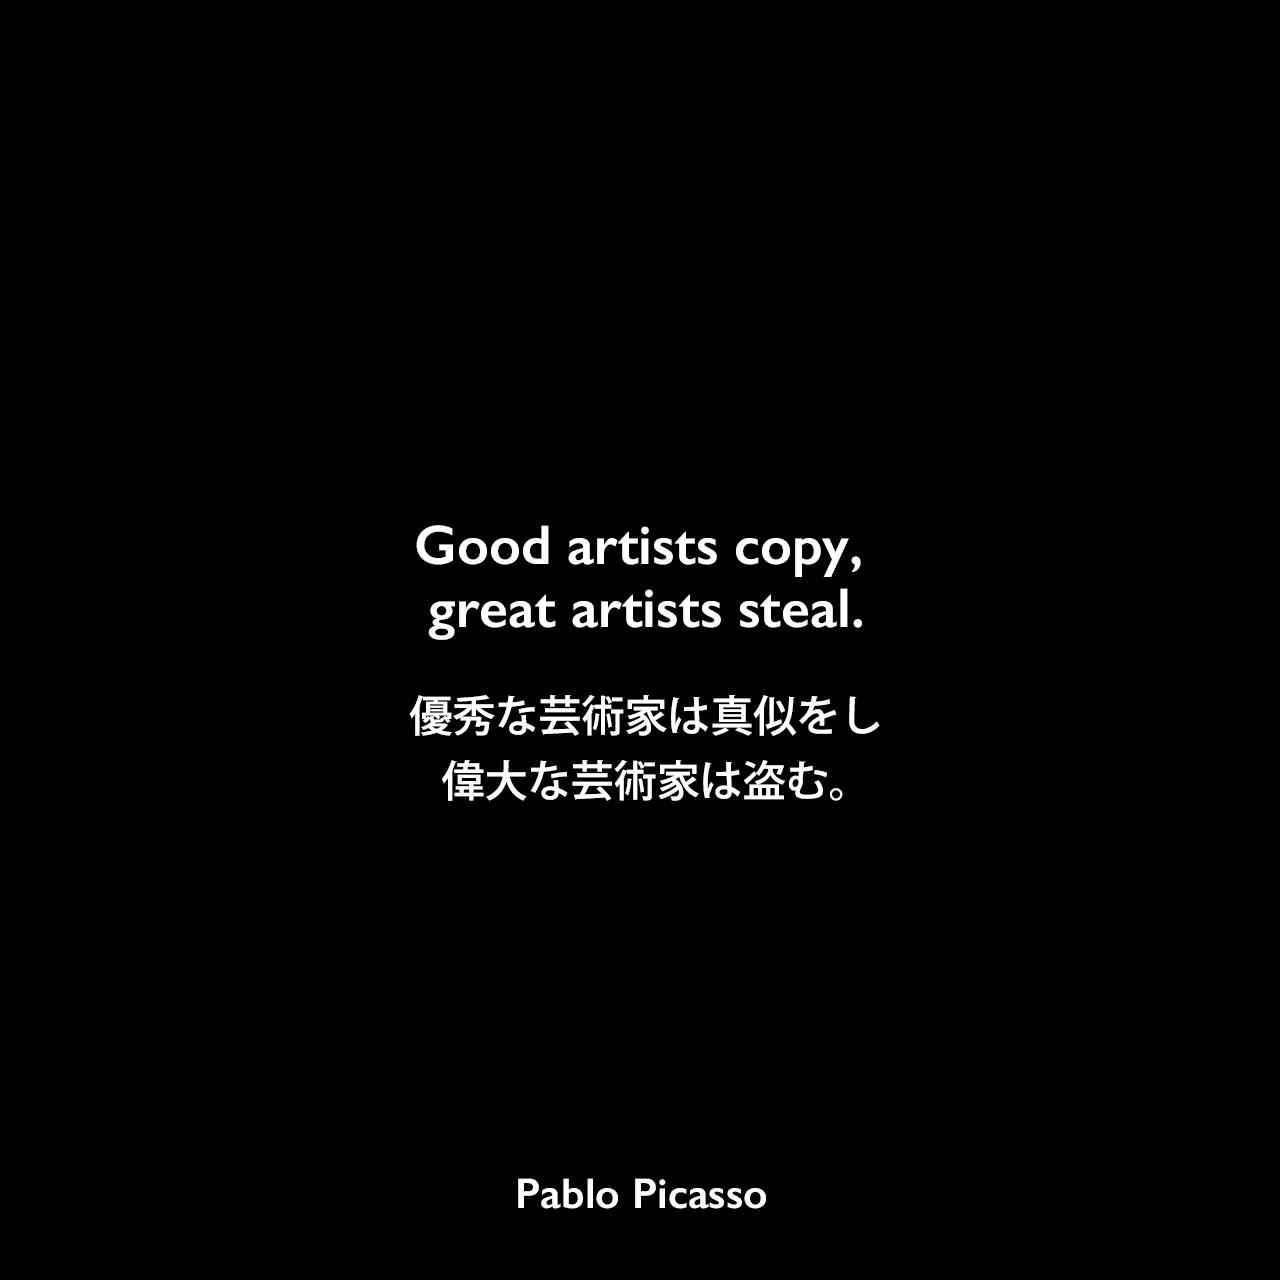 Good artists copy, great artists steal.優秀な芸術家は真似をし、偉大な芸術家は盗む。Pablo Picasso